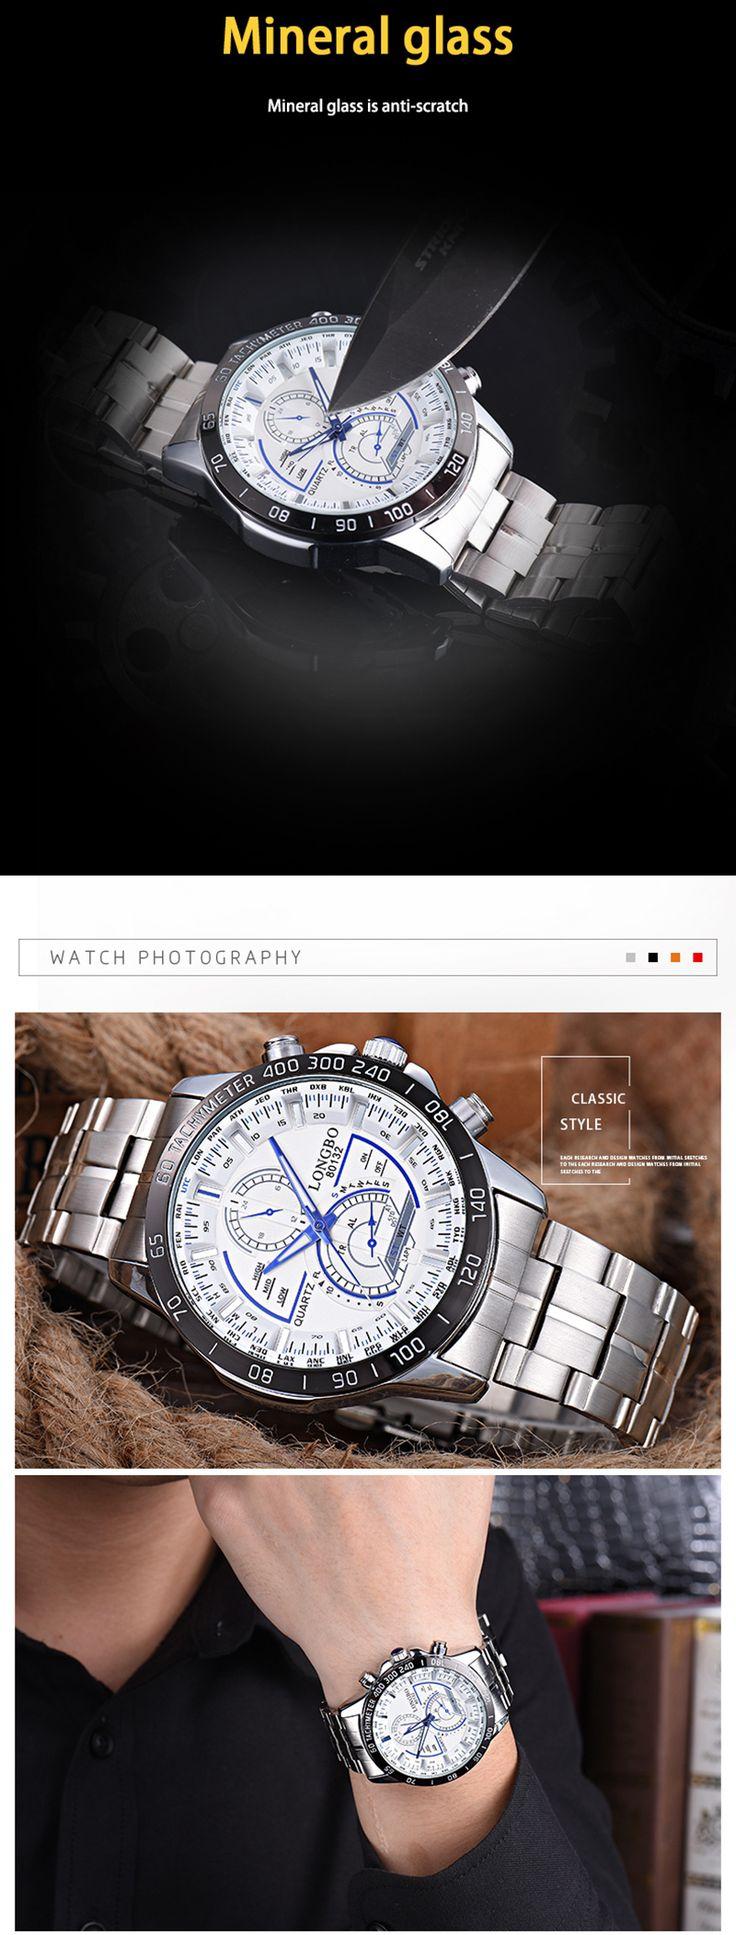 https://www.banggood.com/LONGBO-80132-Men-Watch-Stainless-Steel-Luminous-Fashion-Casual-Quartz-Wrist-Watch-p-1150888.html?p=SF1215375298201312PR&cur_warehouse=CN